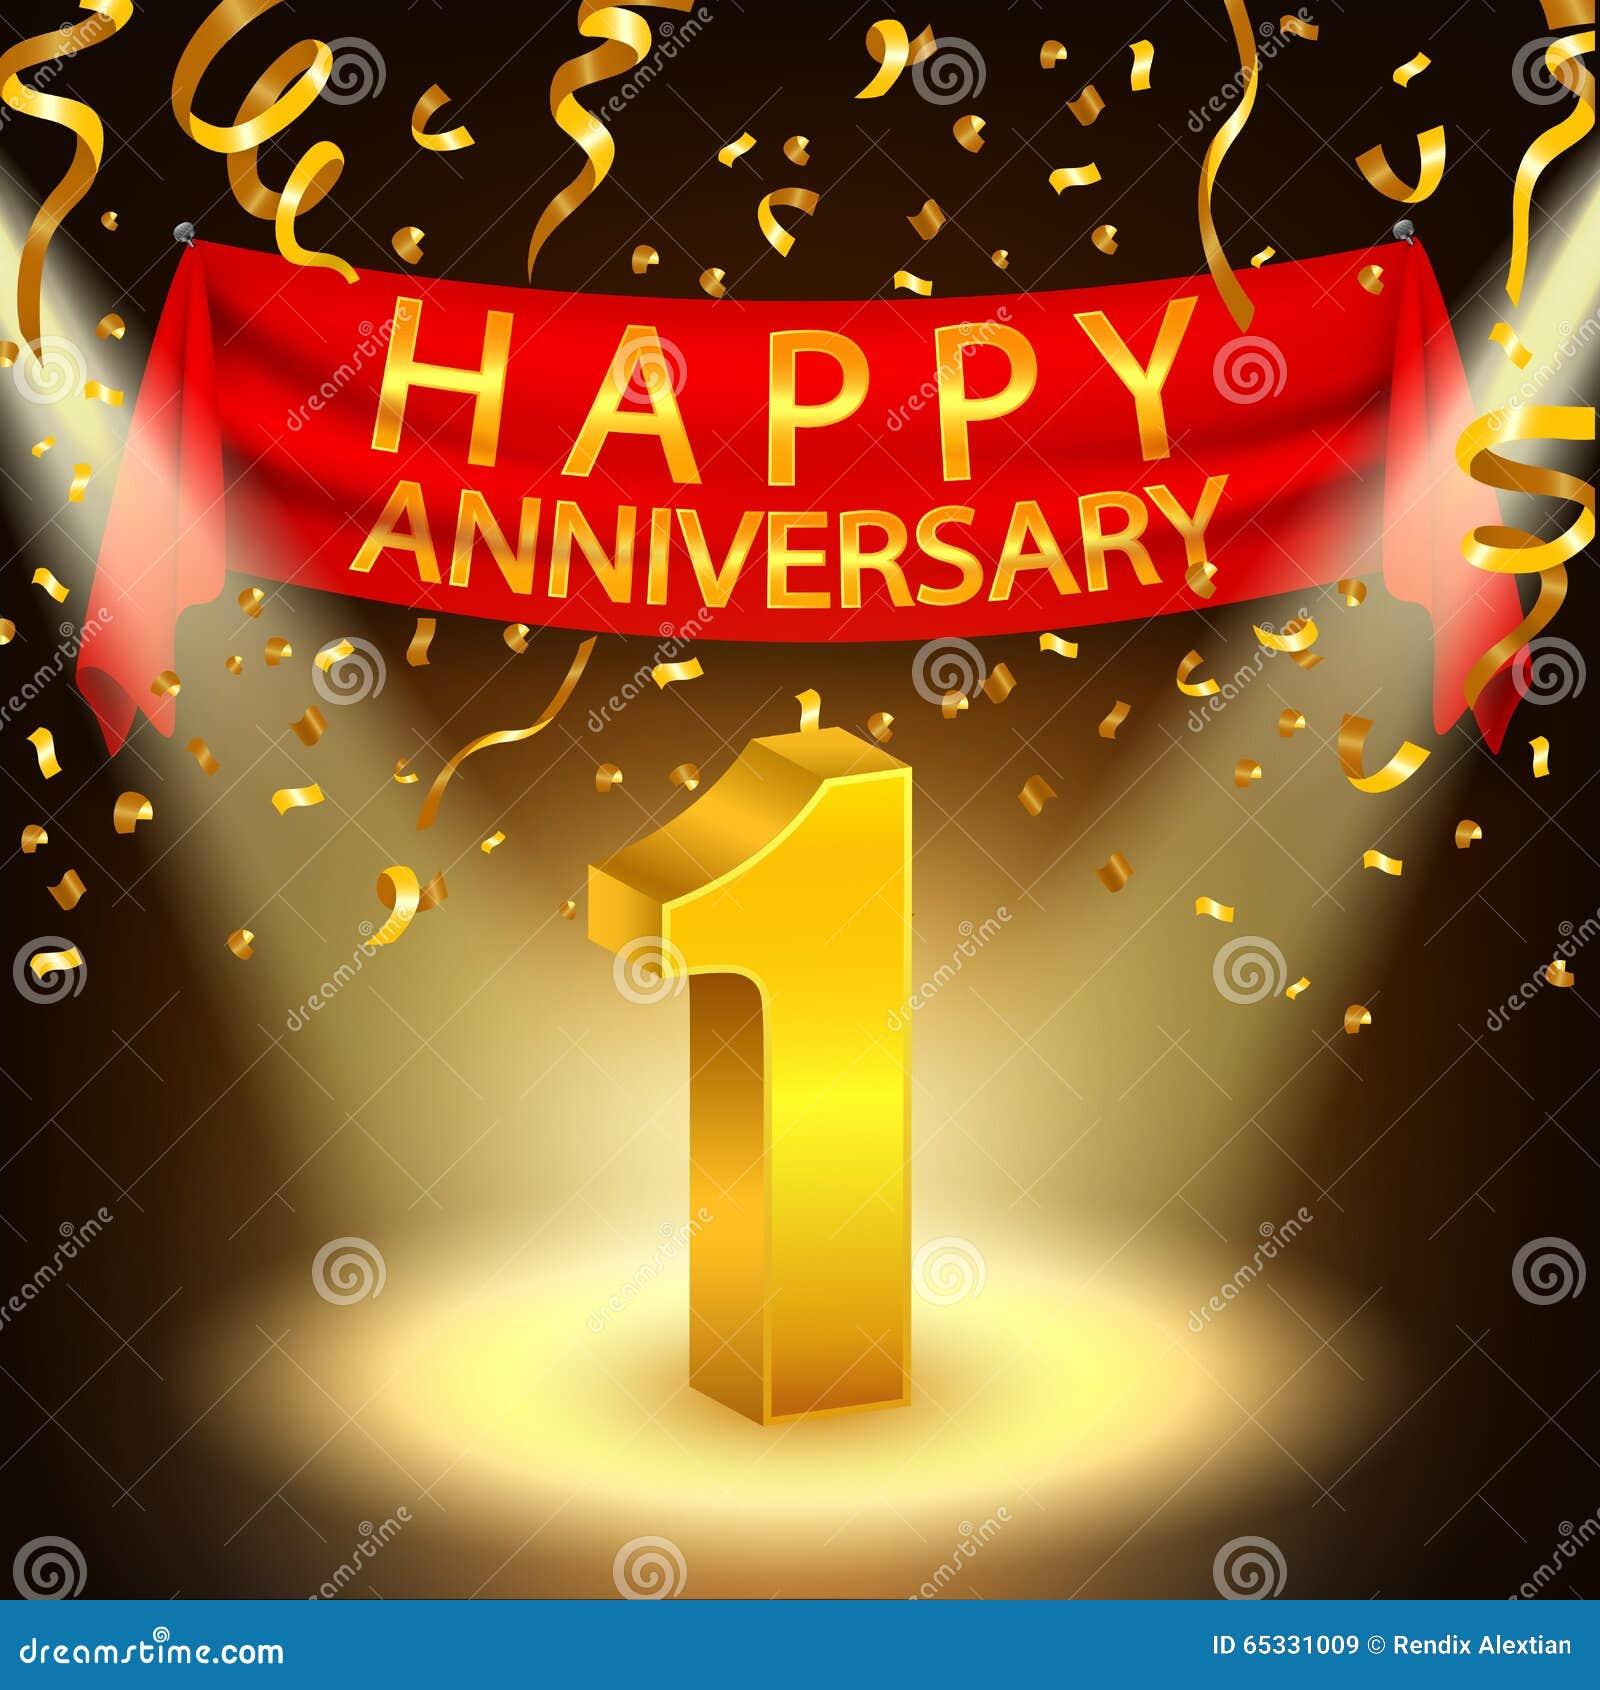 Happy 1st Anniversary Celebration With Golden Confetti And Spotlight Stock Vector